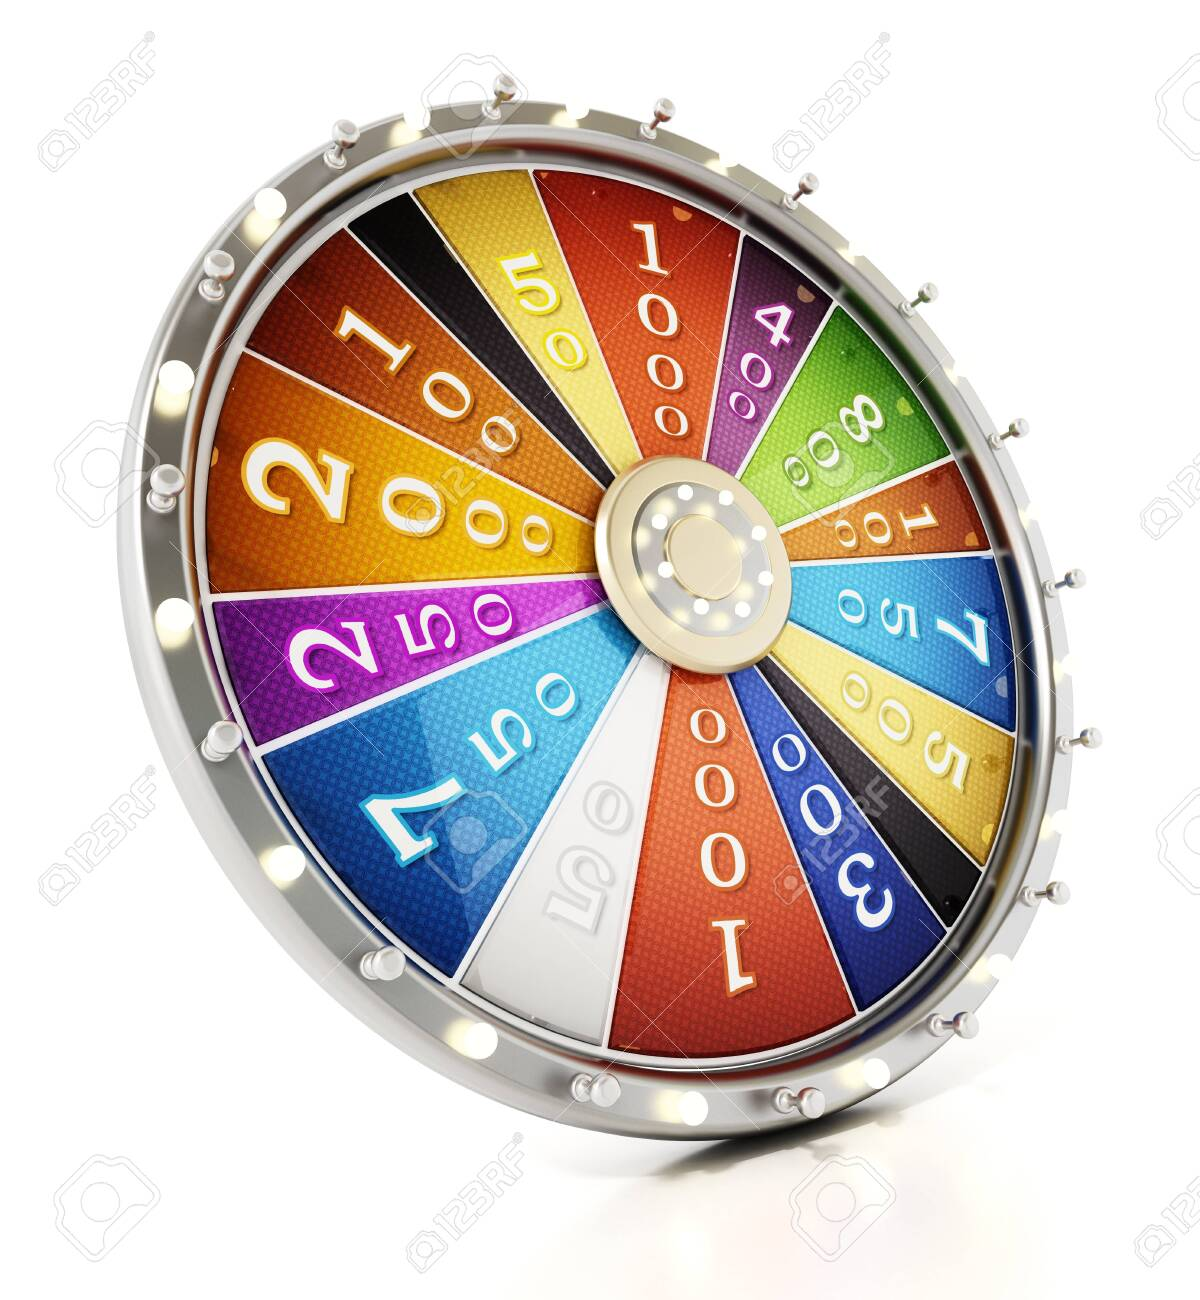 Prize wheel isolated on white background. 3D illustration. - 144846447